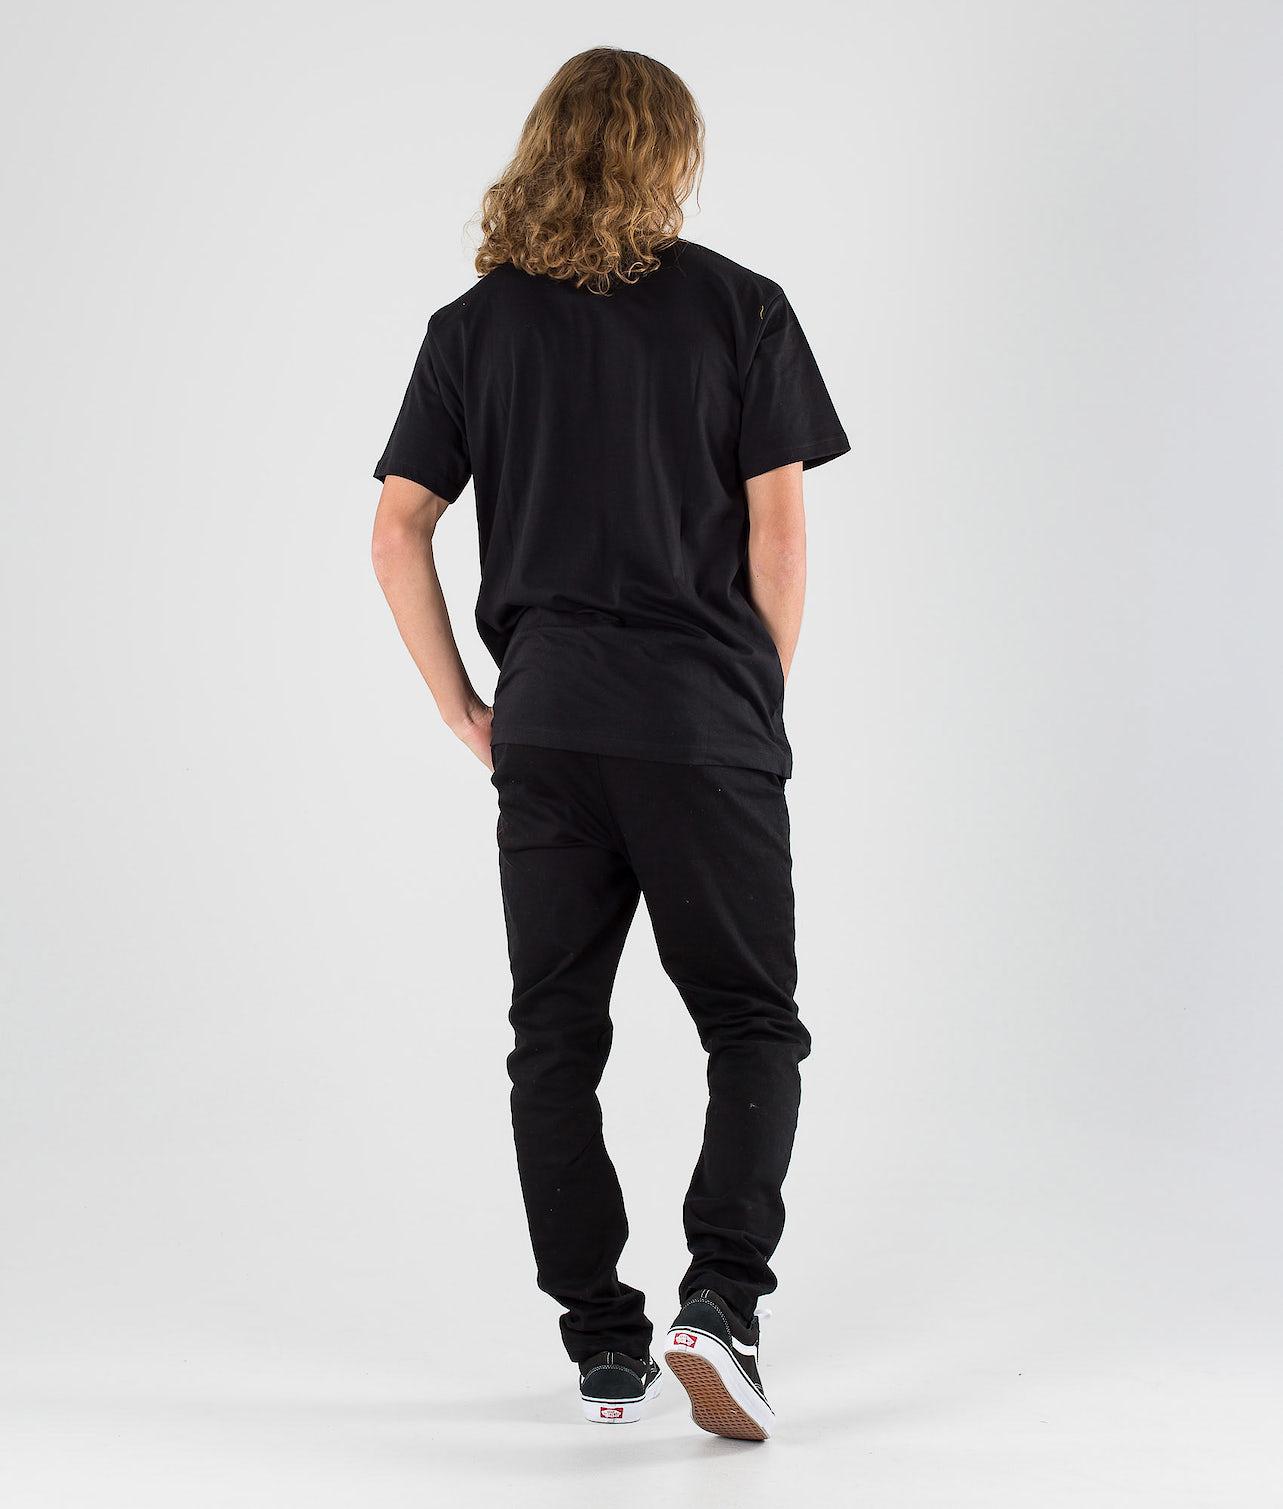 SQRTN Wavy T-shirt Black